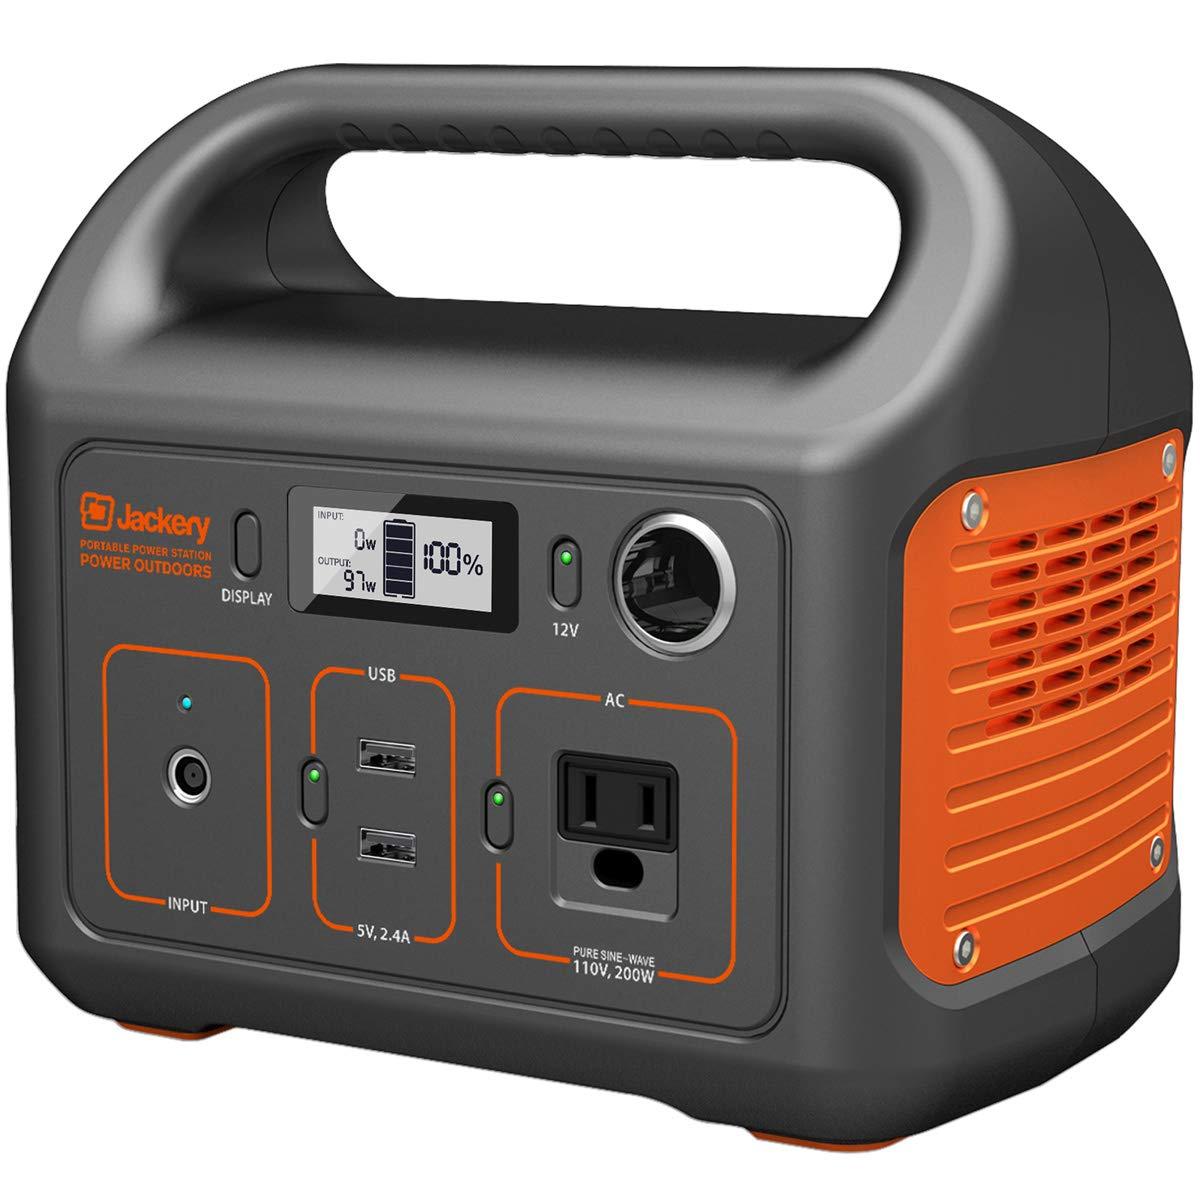 Jackery Portable Power Station Generator